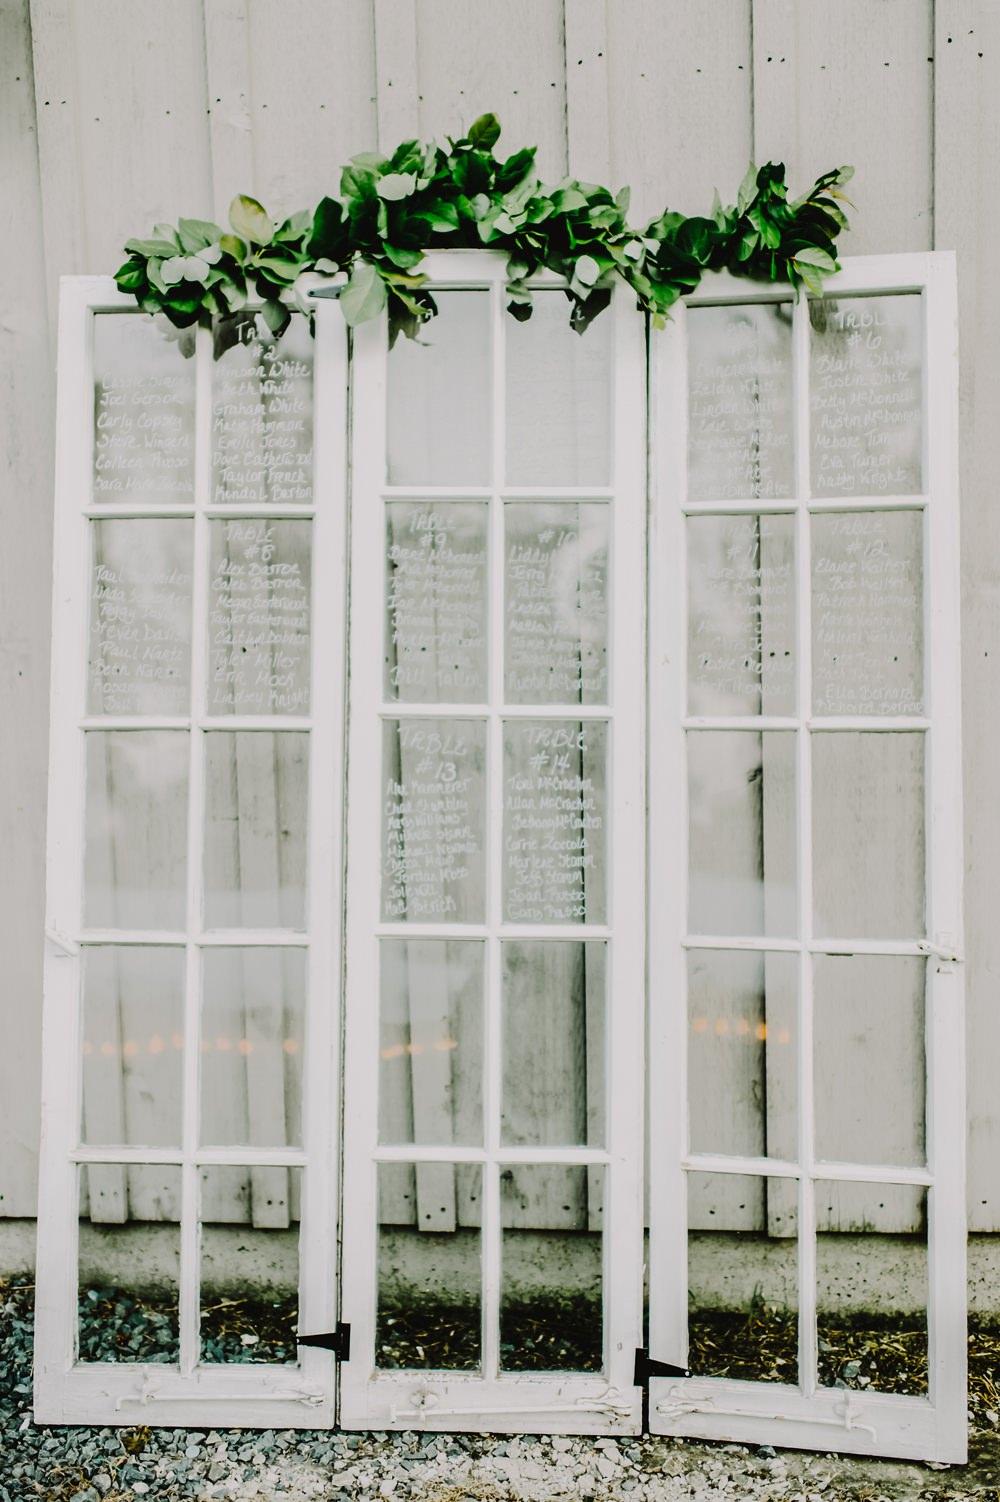 Window Glass Seating Plan Table Chart Greenery Maryland Wedding L. Hewitt Photography